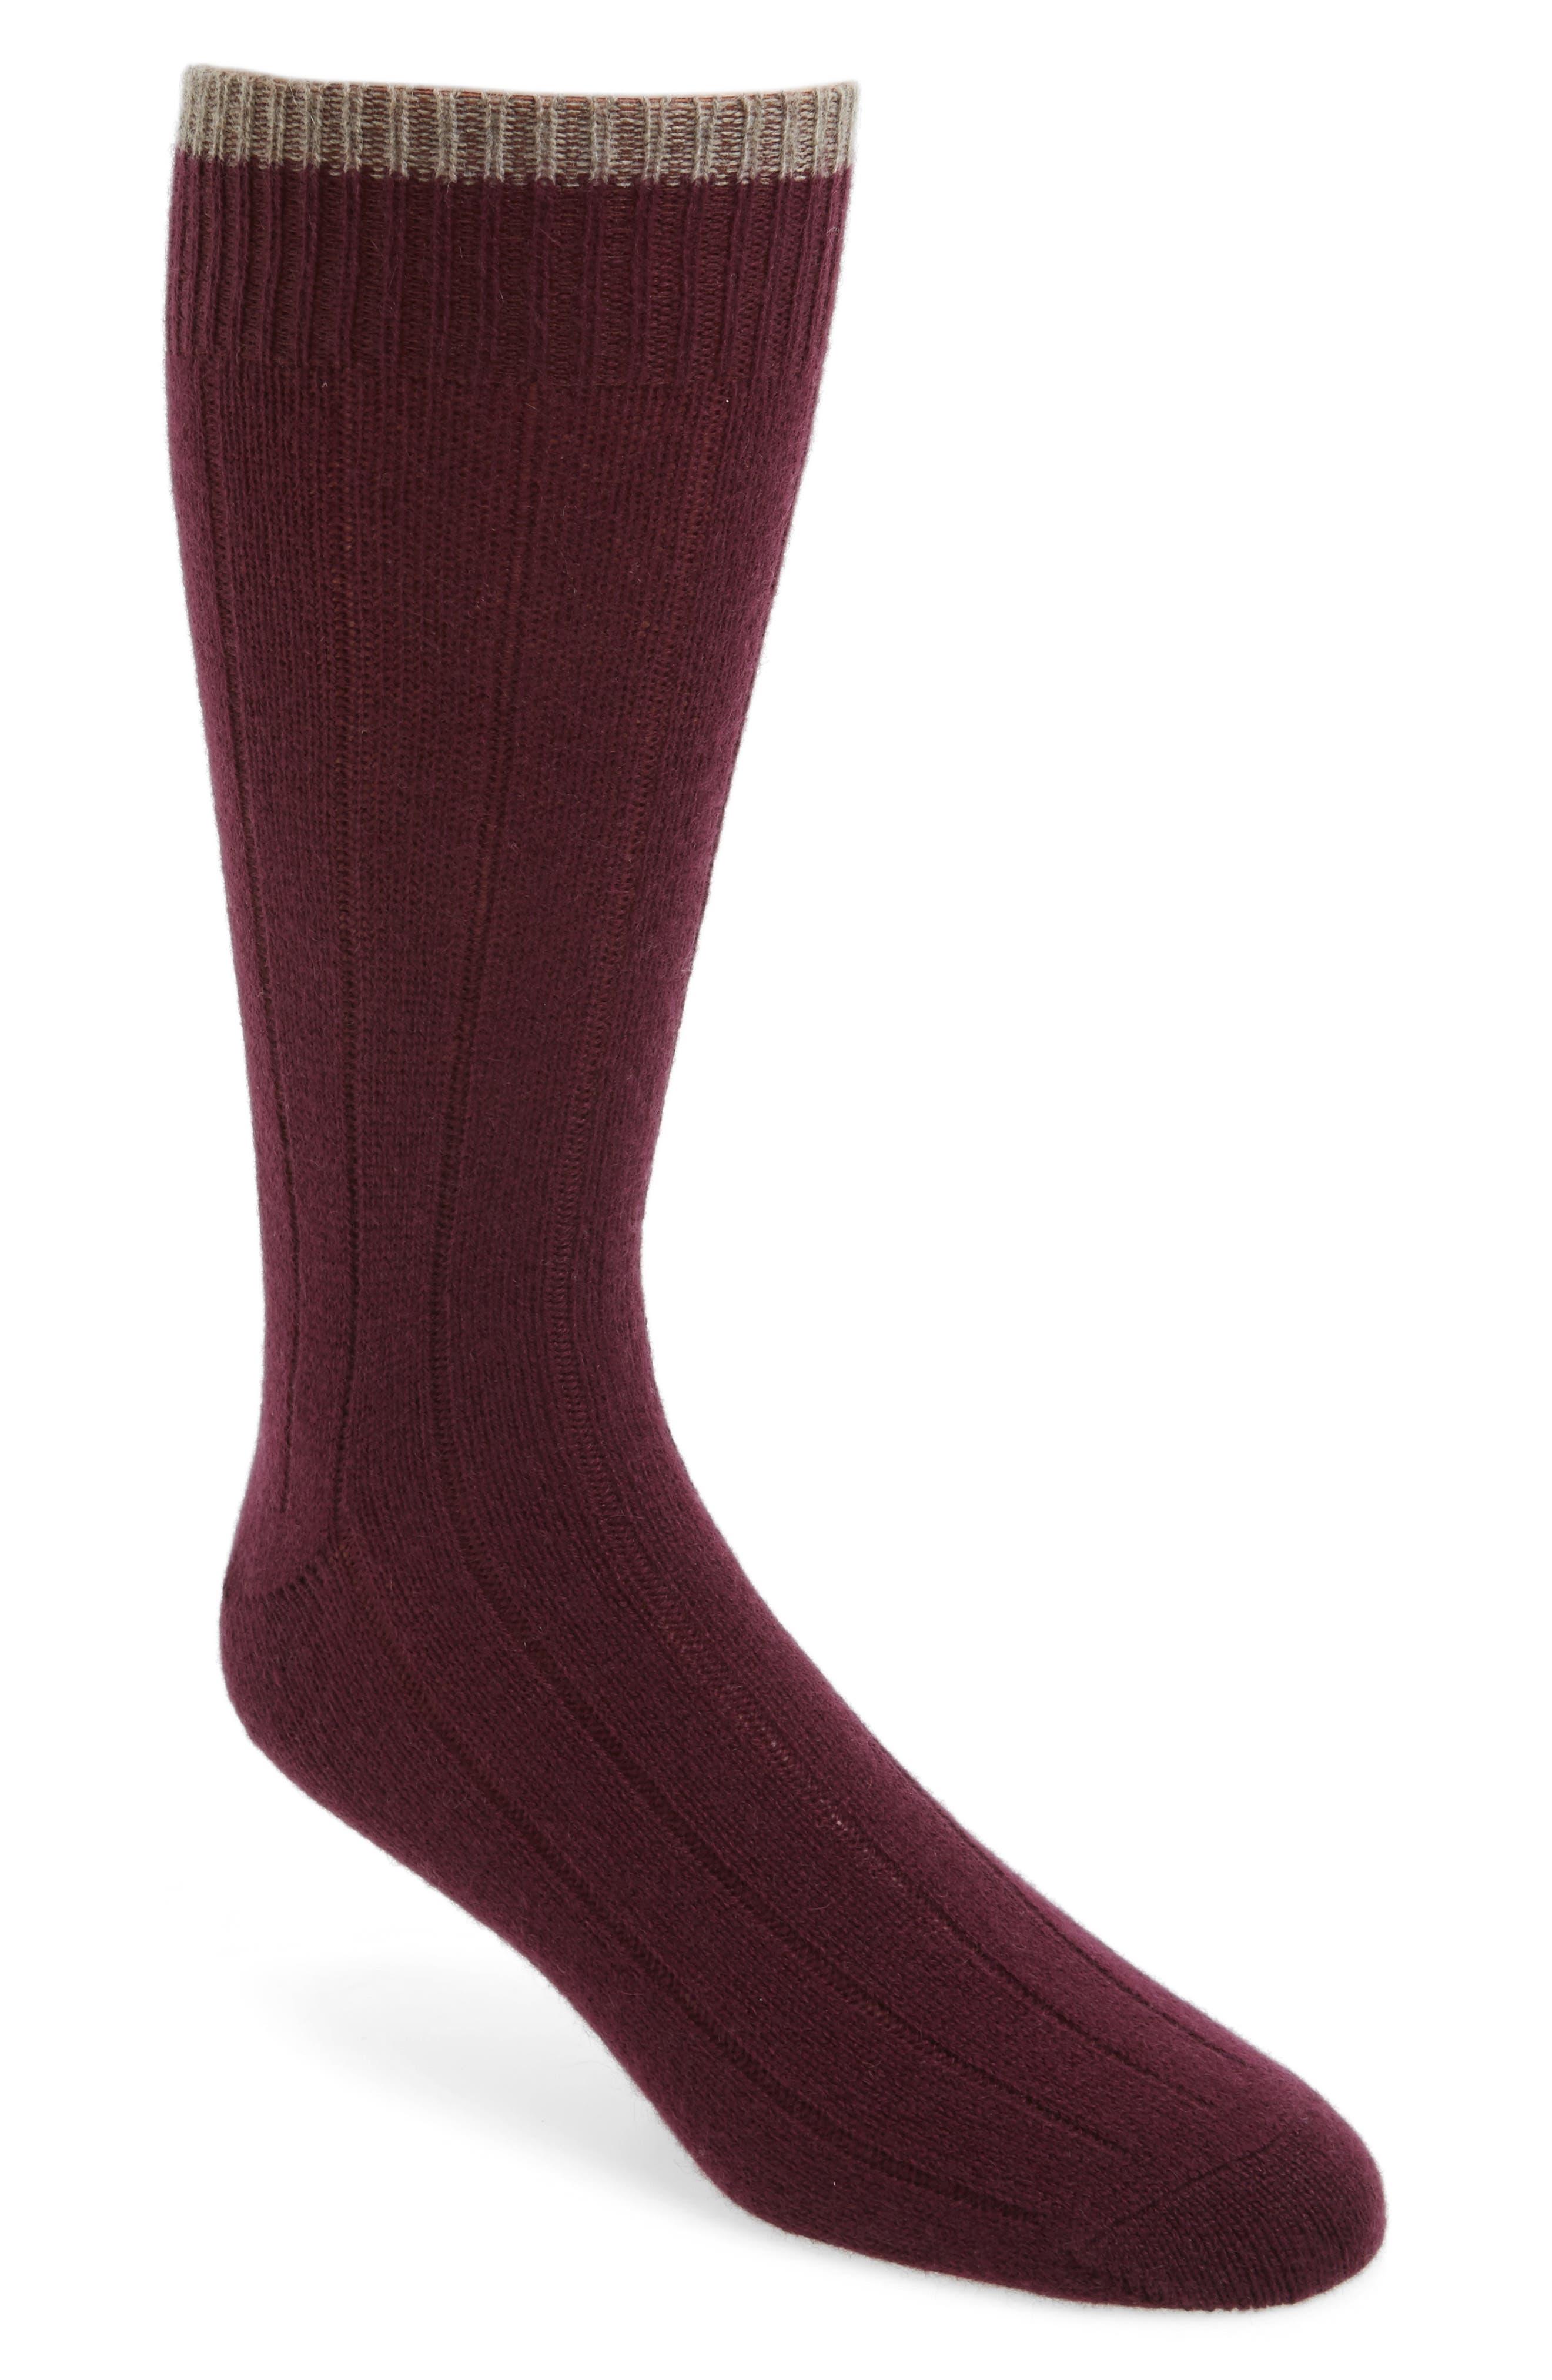 Alternate Image 1 Selected - John W. Nordstrom® Cashmere Blend Socks